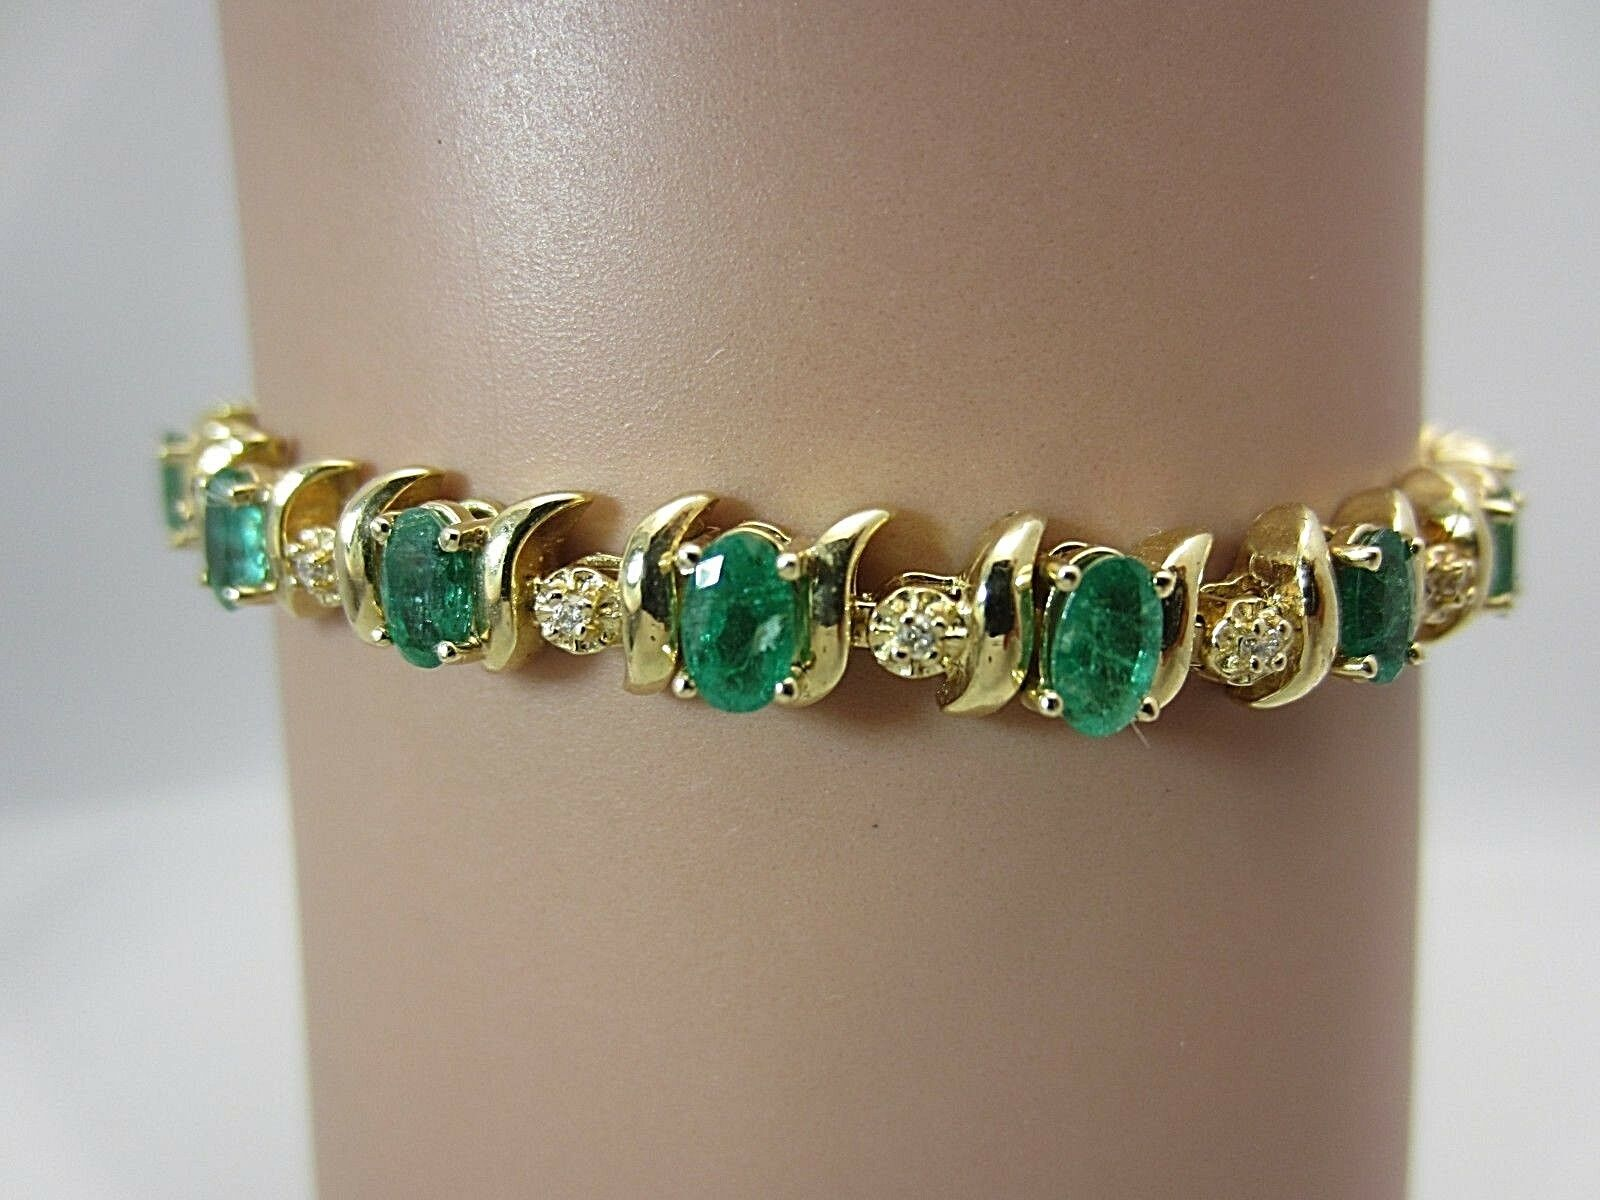 14K Yellow gold Colombian Emerald and Diamond Bracelet 4.50 Carats